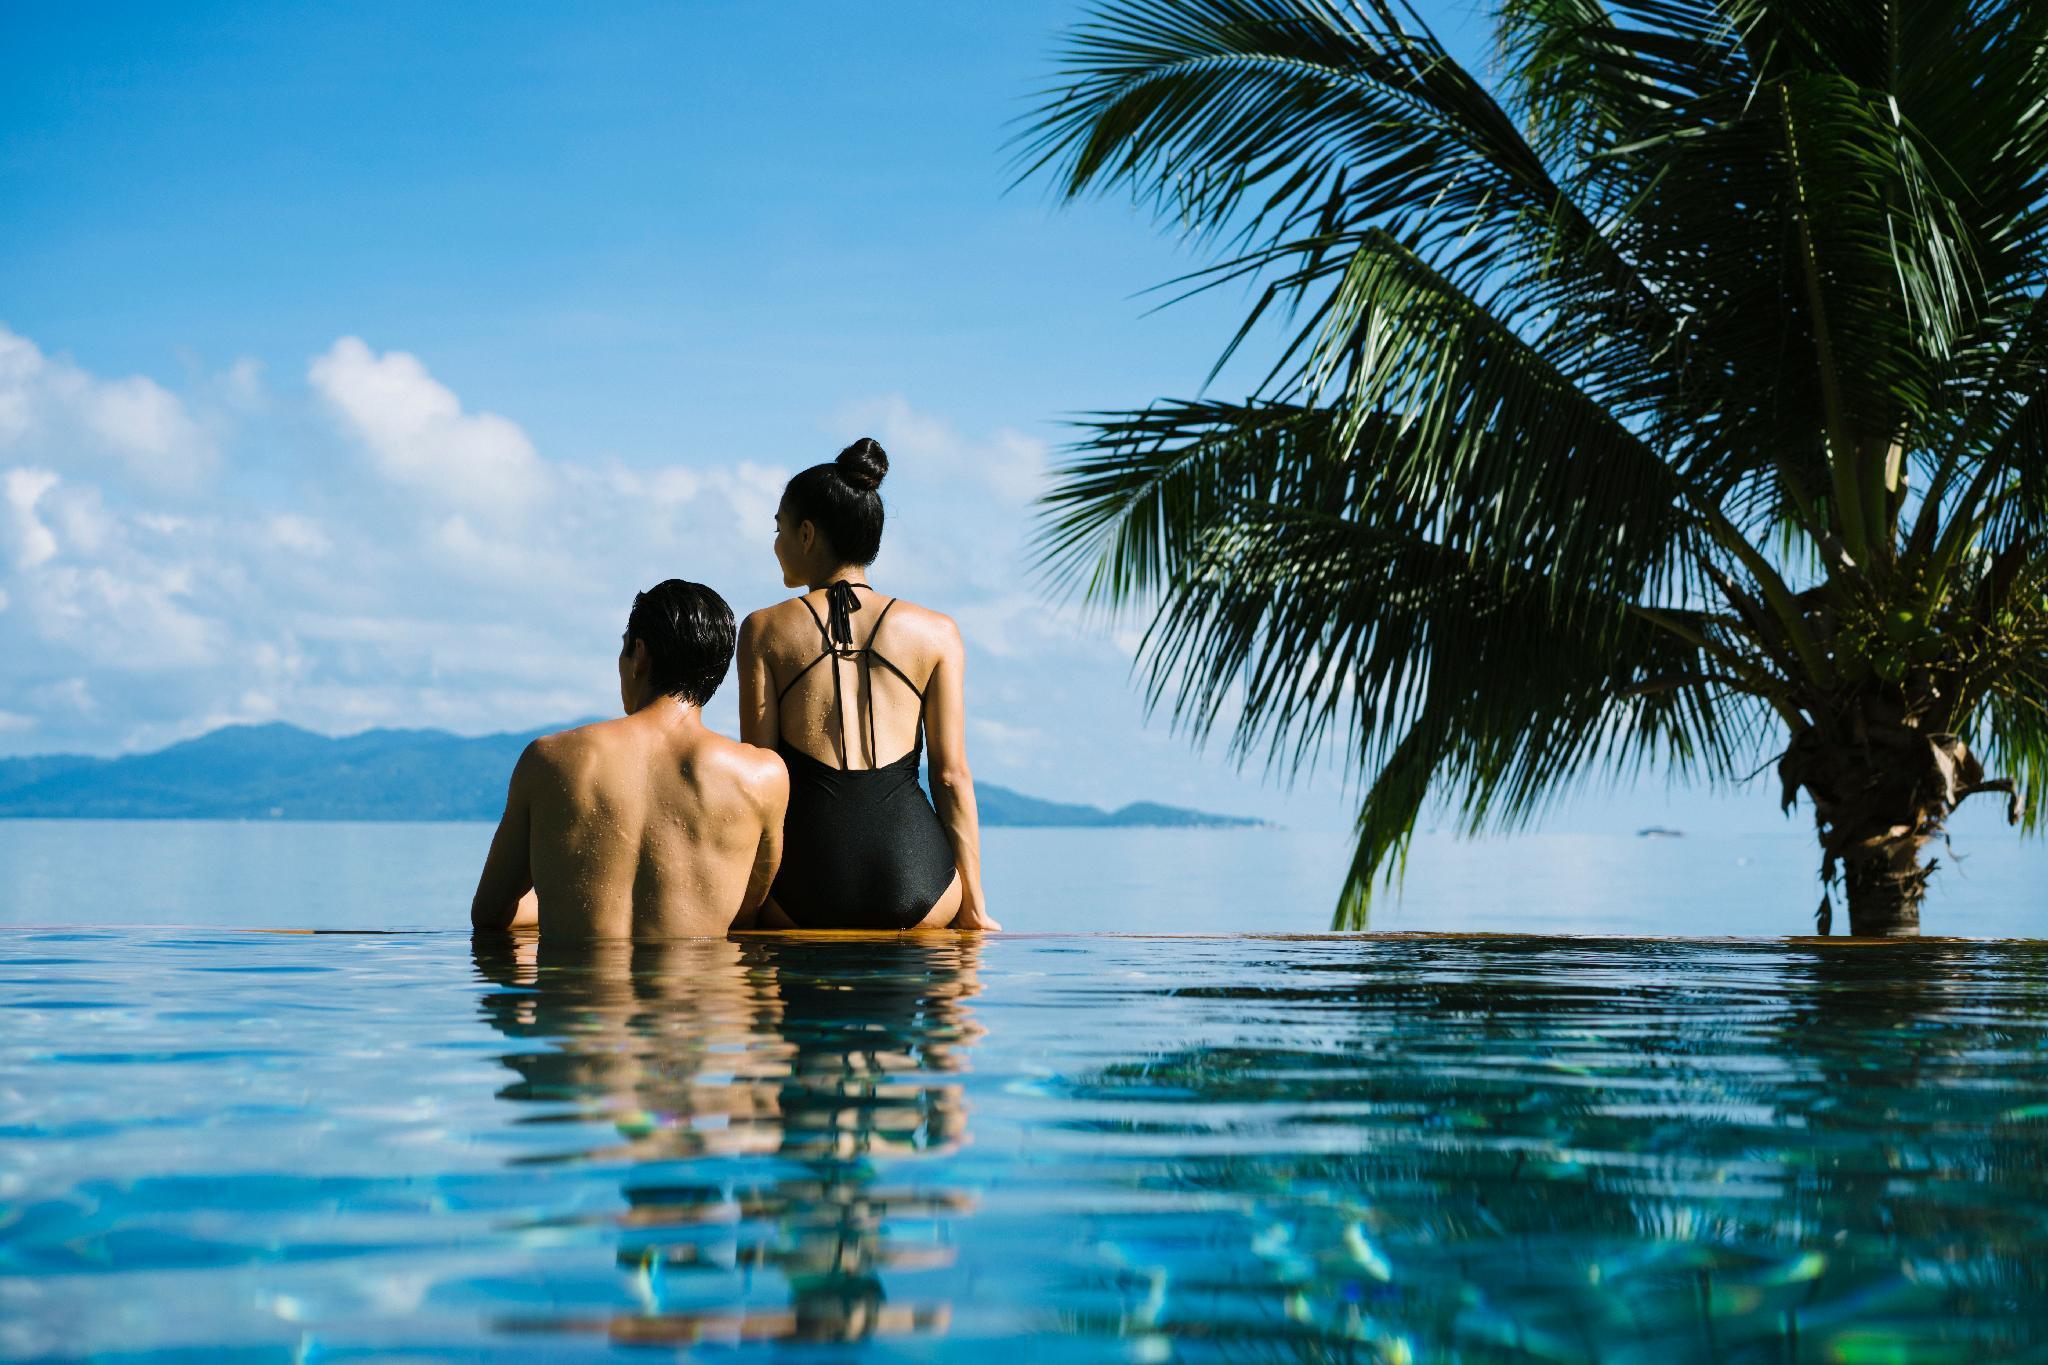 Anantara Bophut Koh Samui Resort อนันตรา บ่อผุด เกาะสมุย รีสอร์ต